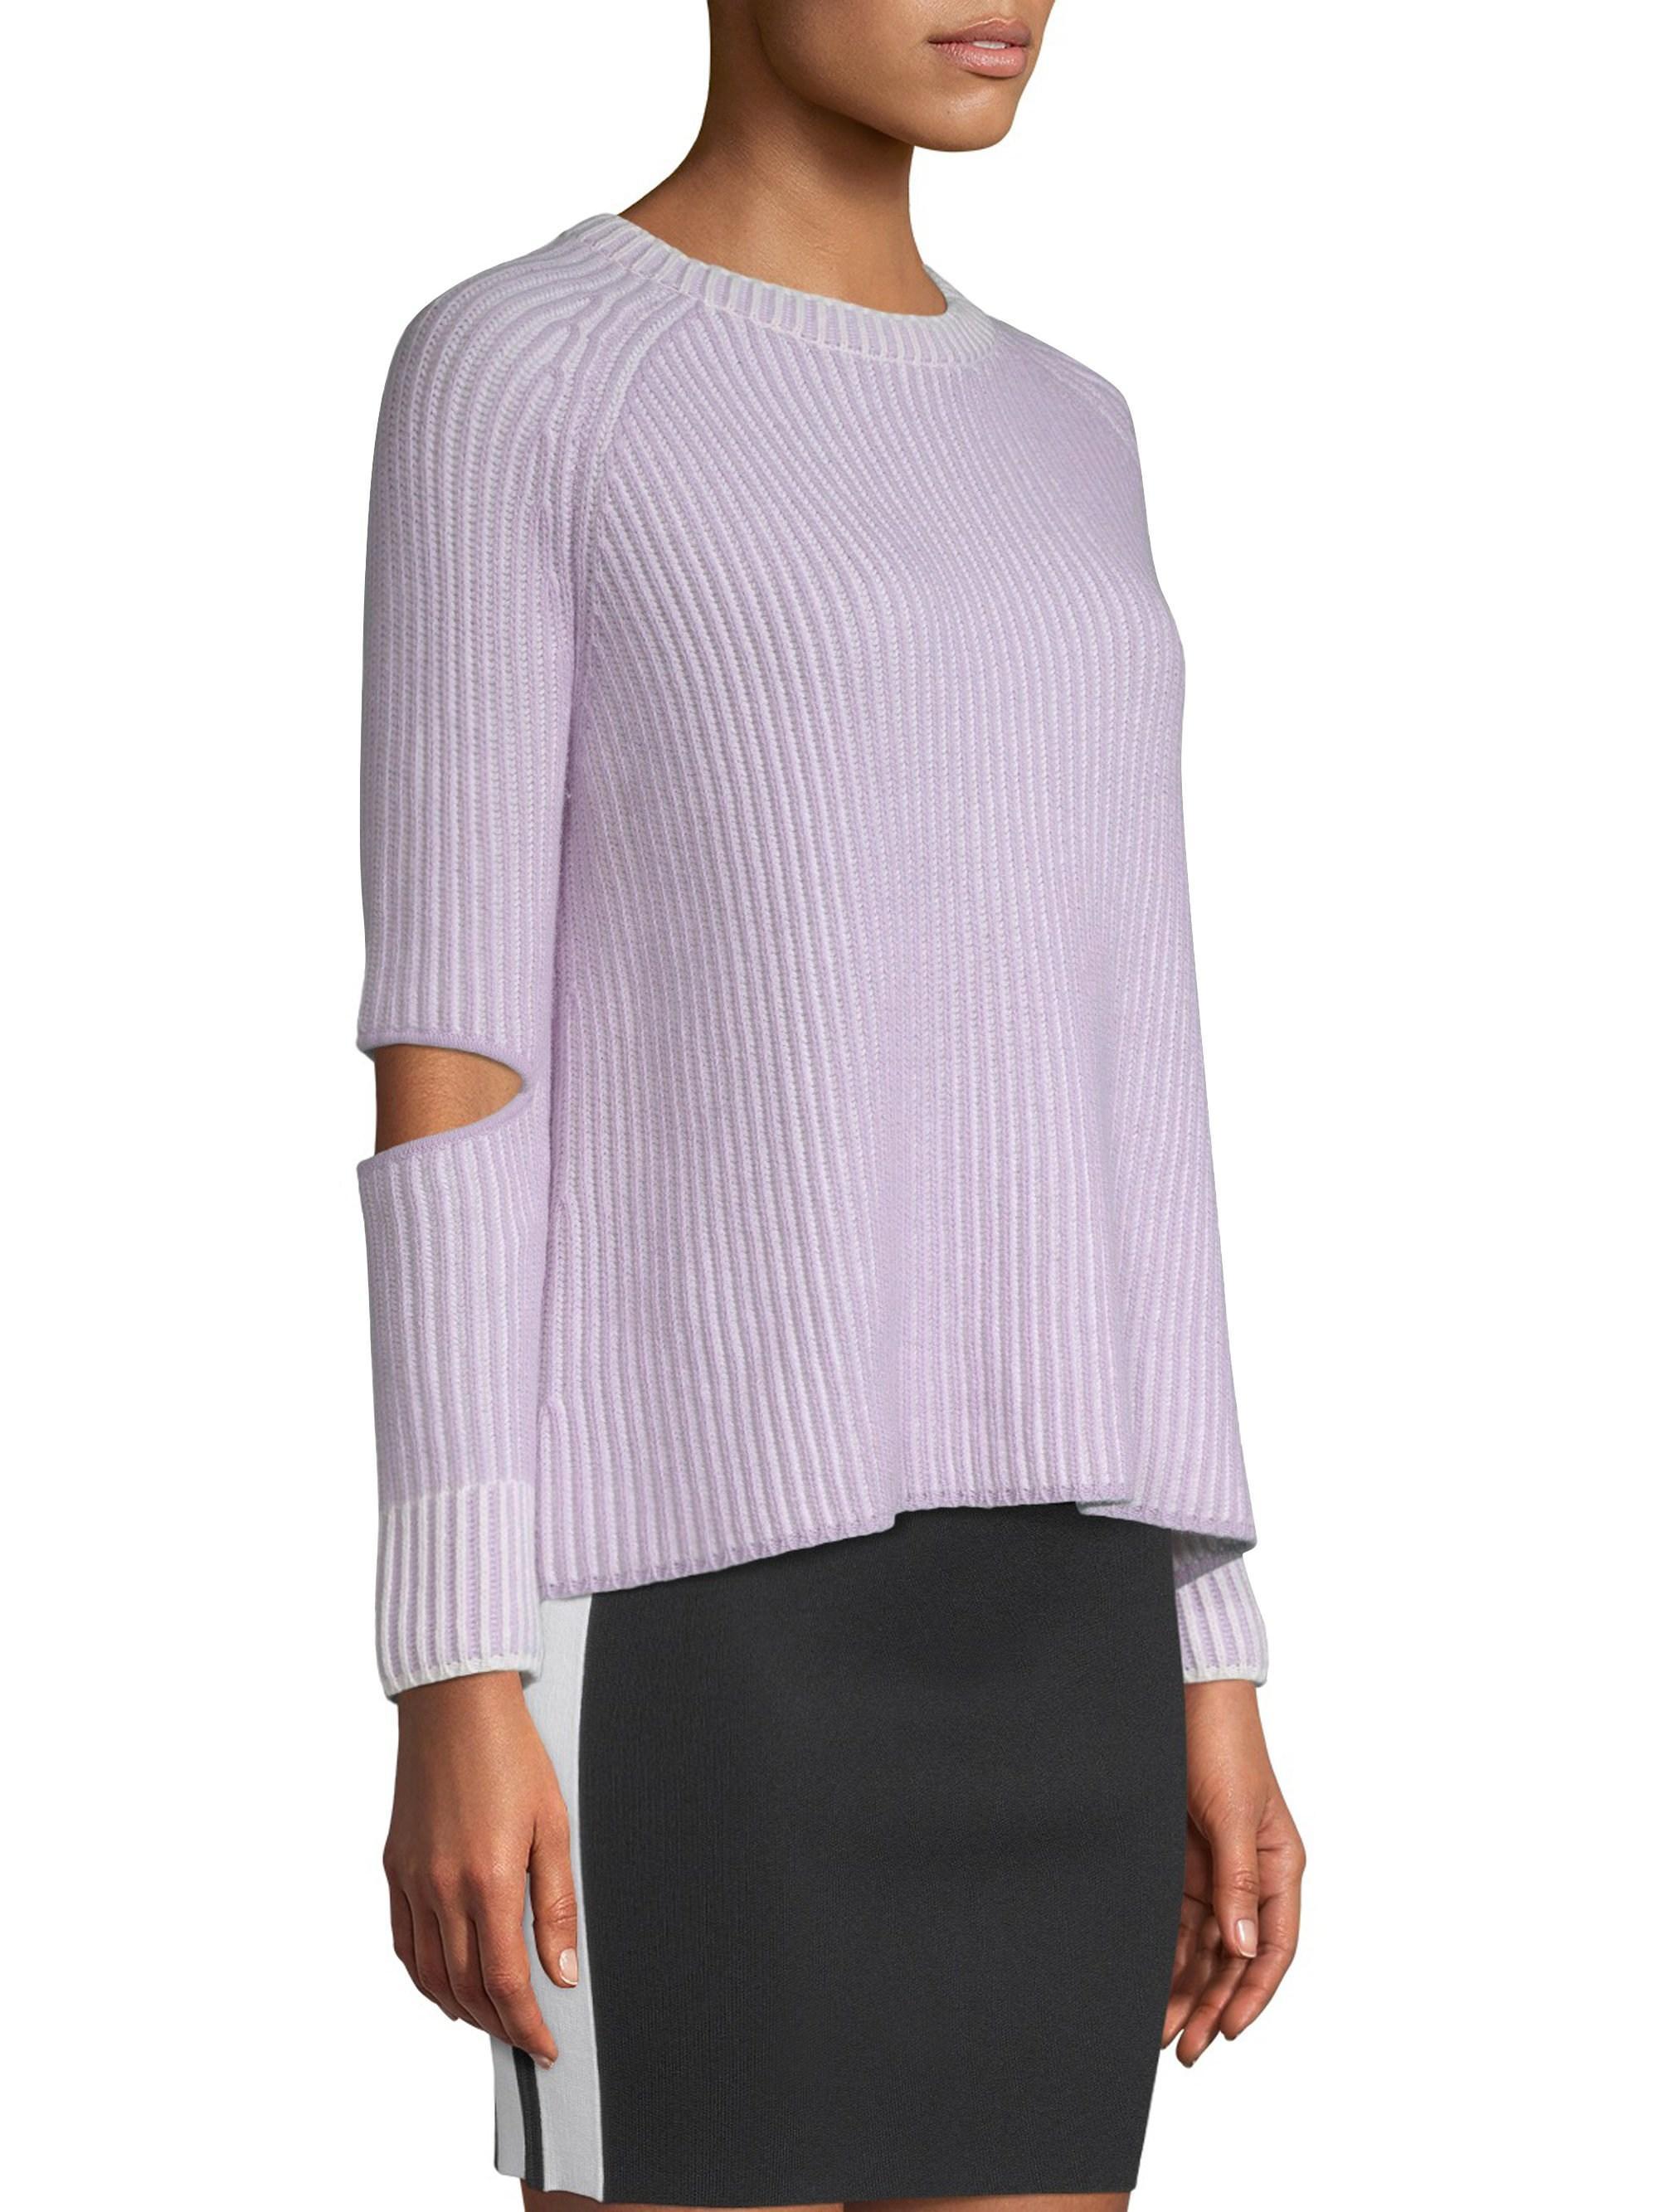 Zoe Jordan Women s Turing Knit Cashmere-wool Sweater - Lilac White ... ffa41020a8